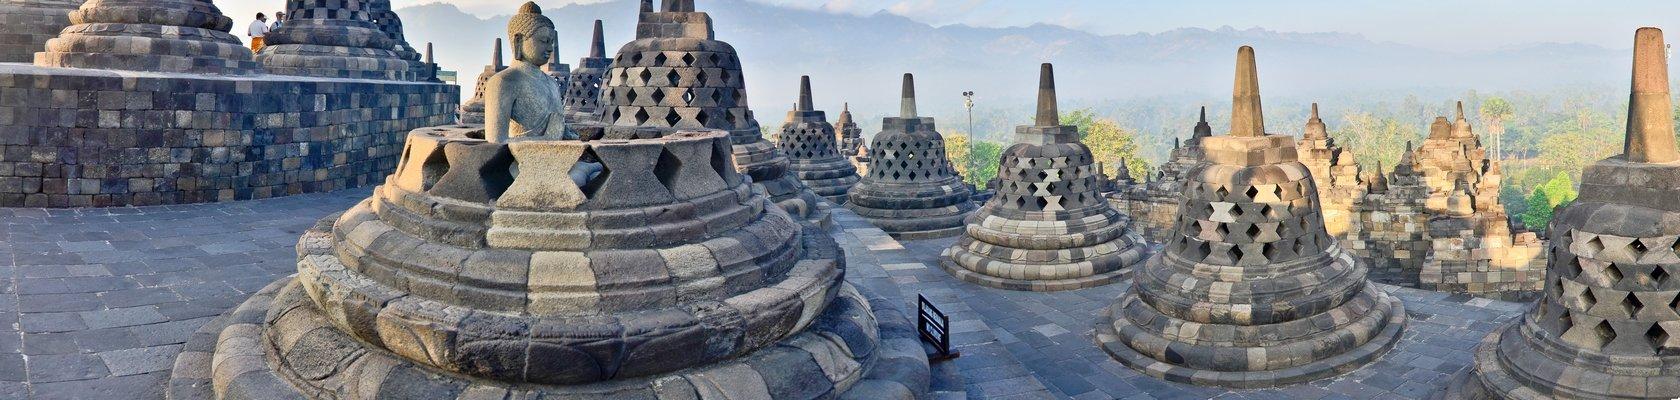 Bezoek aan de beroemde Borobudur tempels, Jogjakarta